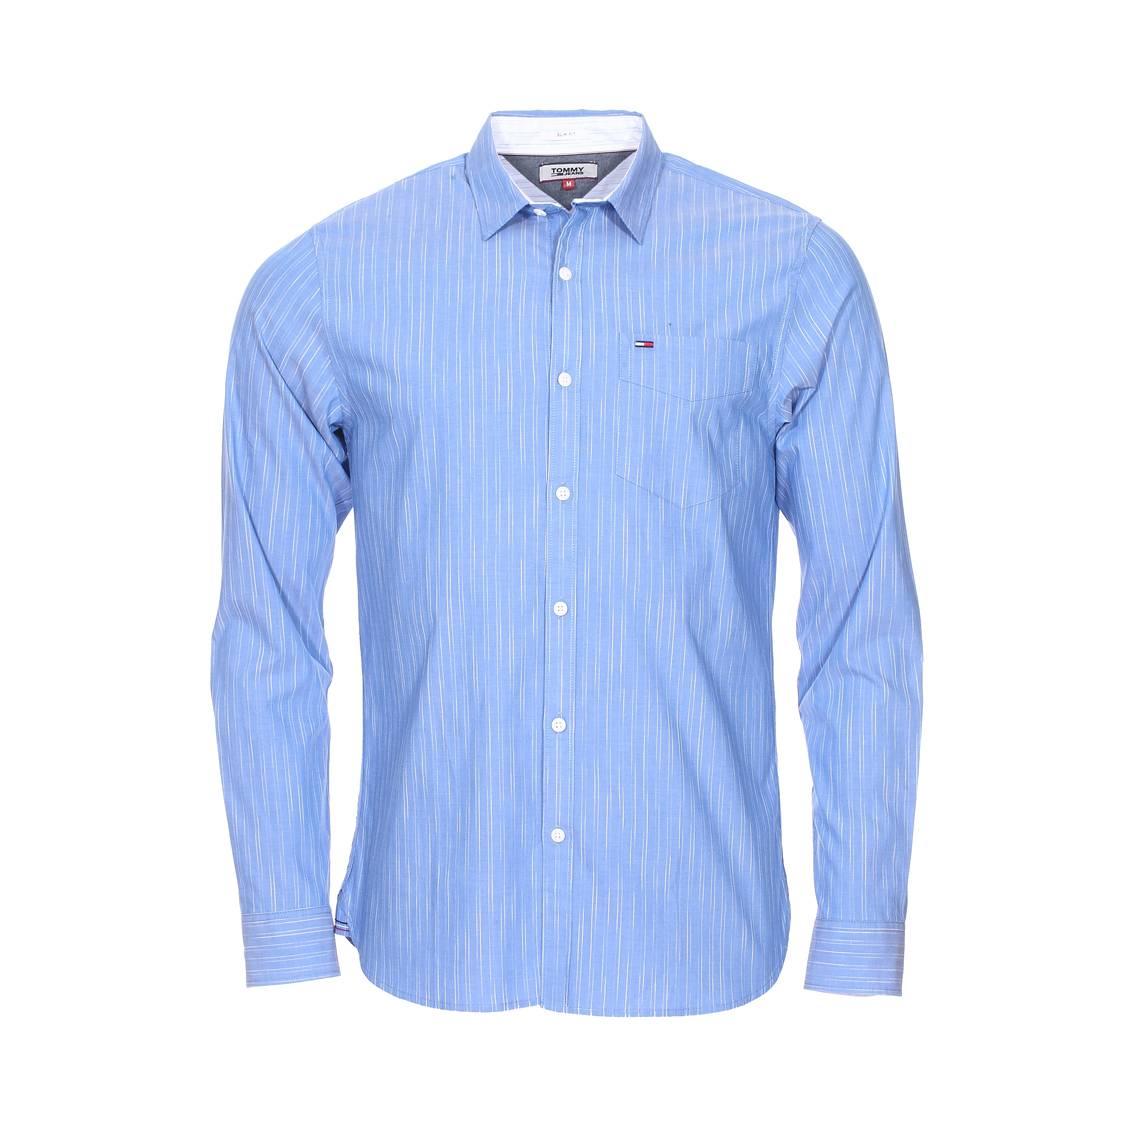 9b8d24111830e Chemise slim Tommy Jeans Spacedye Stripe en coton stretch bleu à fines  rayures blanches ...